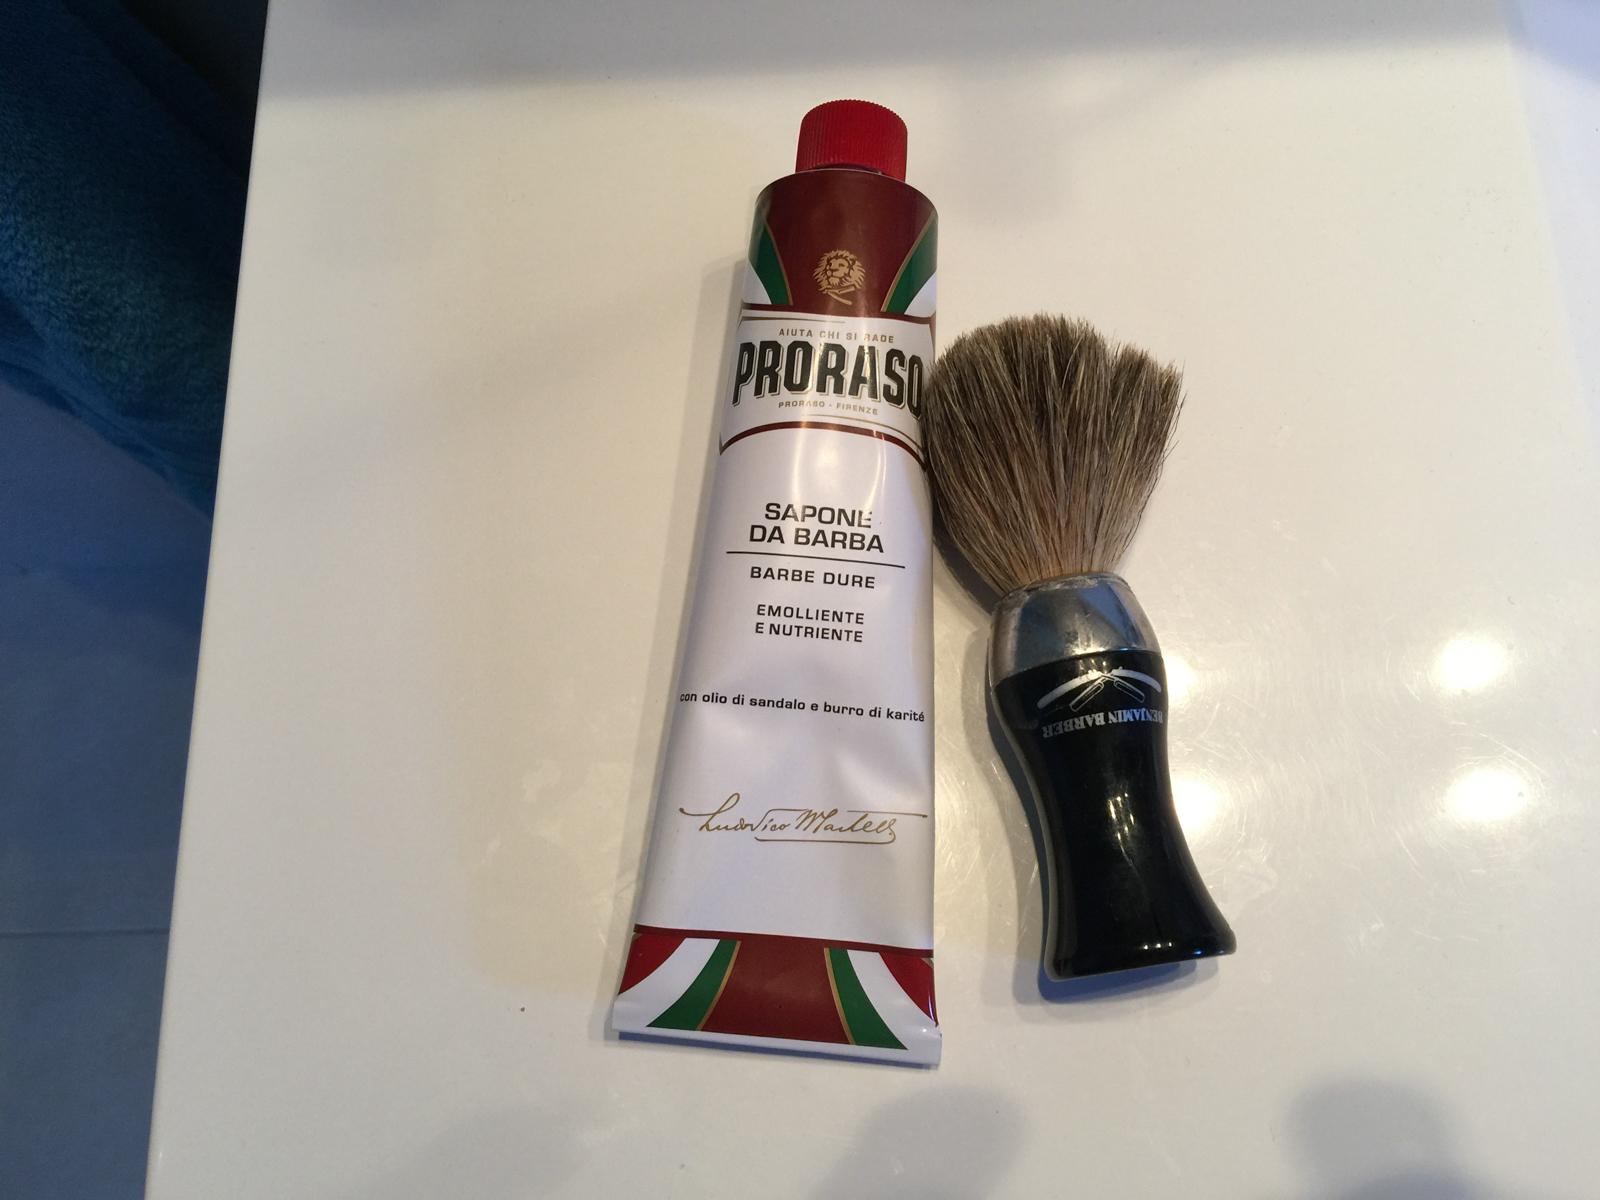 2017-Mars-03 Proraso barberkrem-2